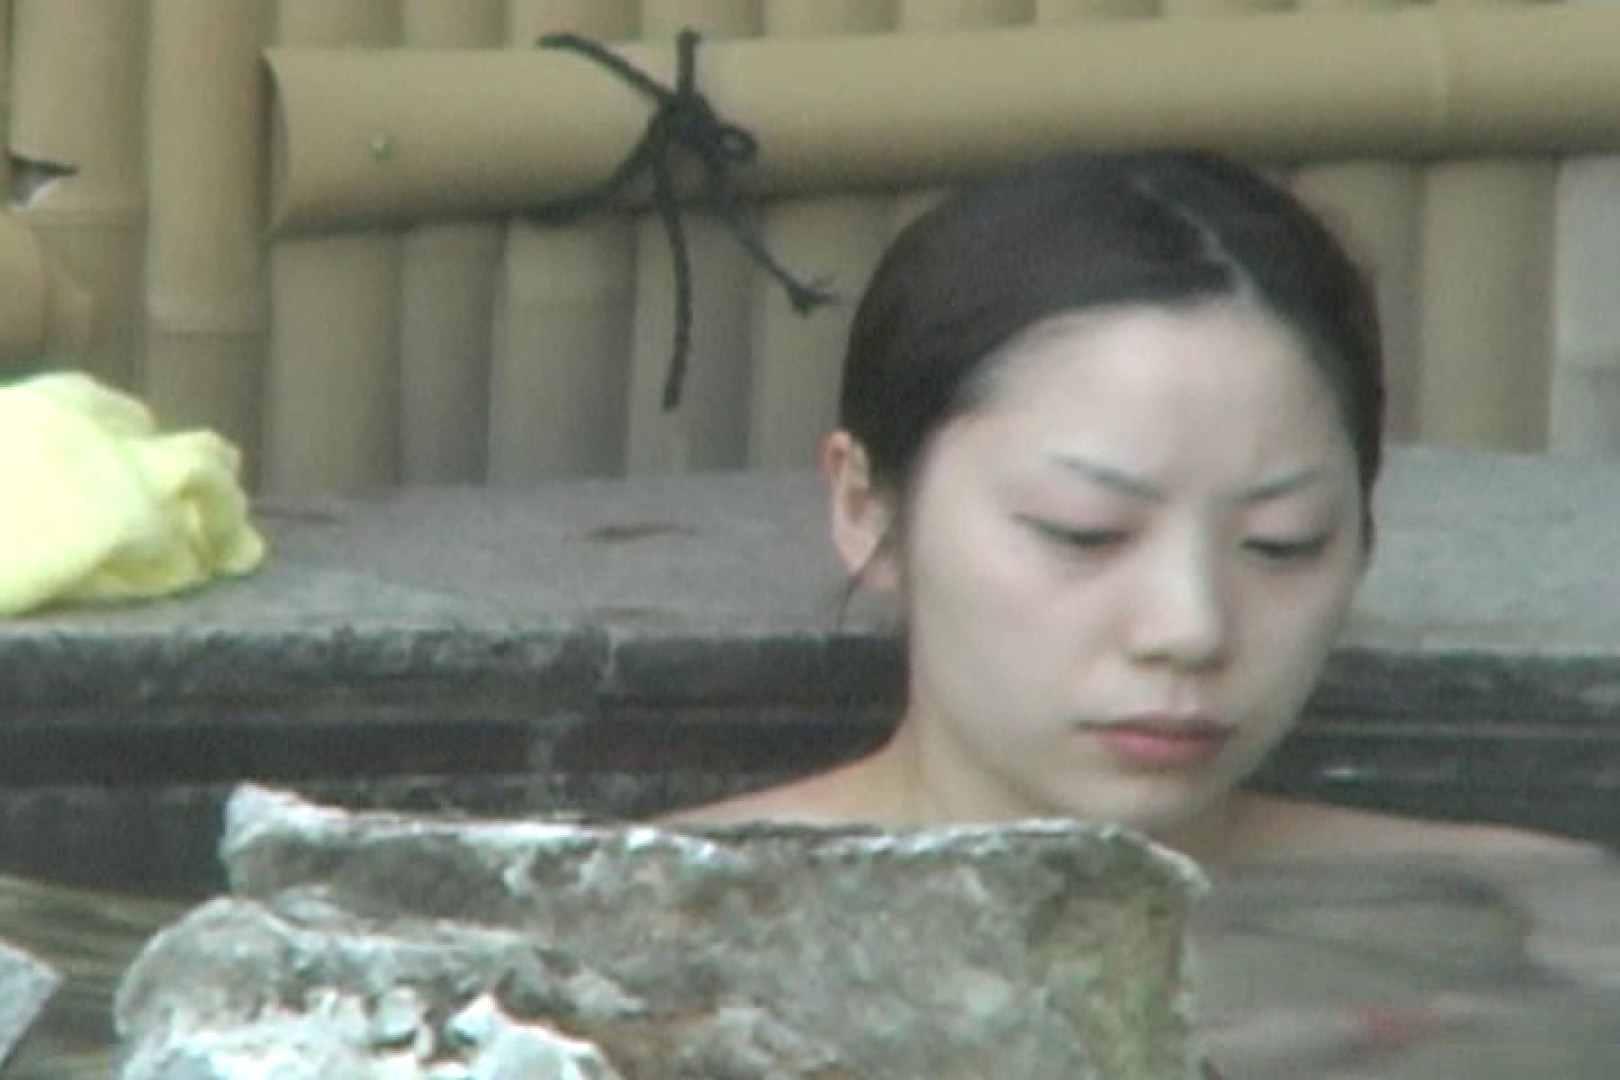 Aquaな露天風呂Vol.596 OLセックス | 盗撮  77画像 31